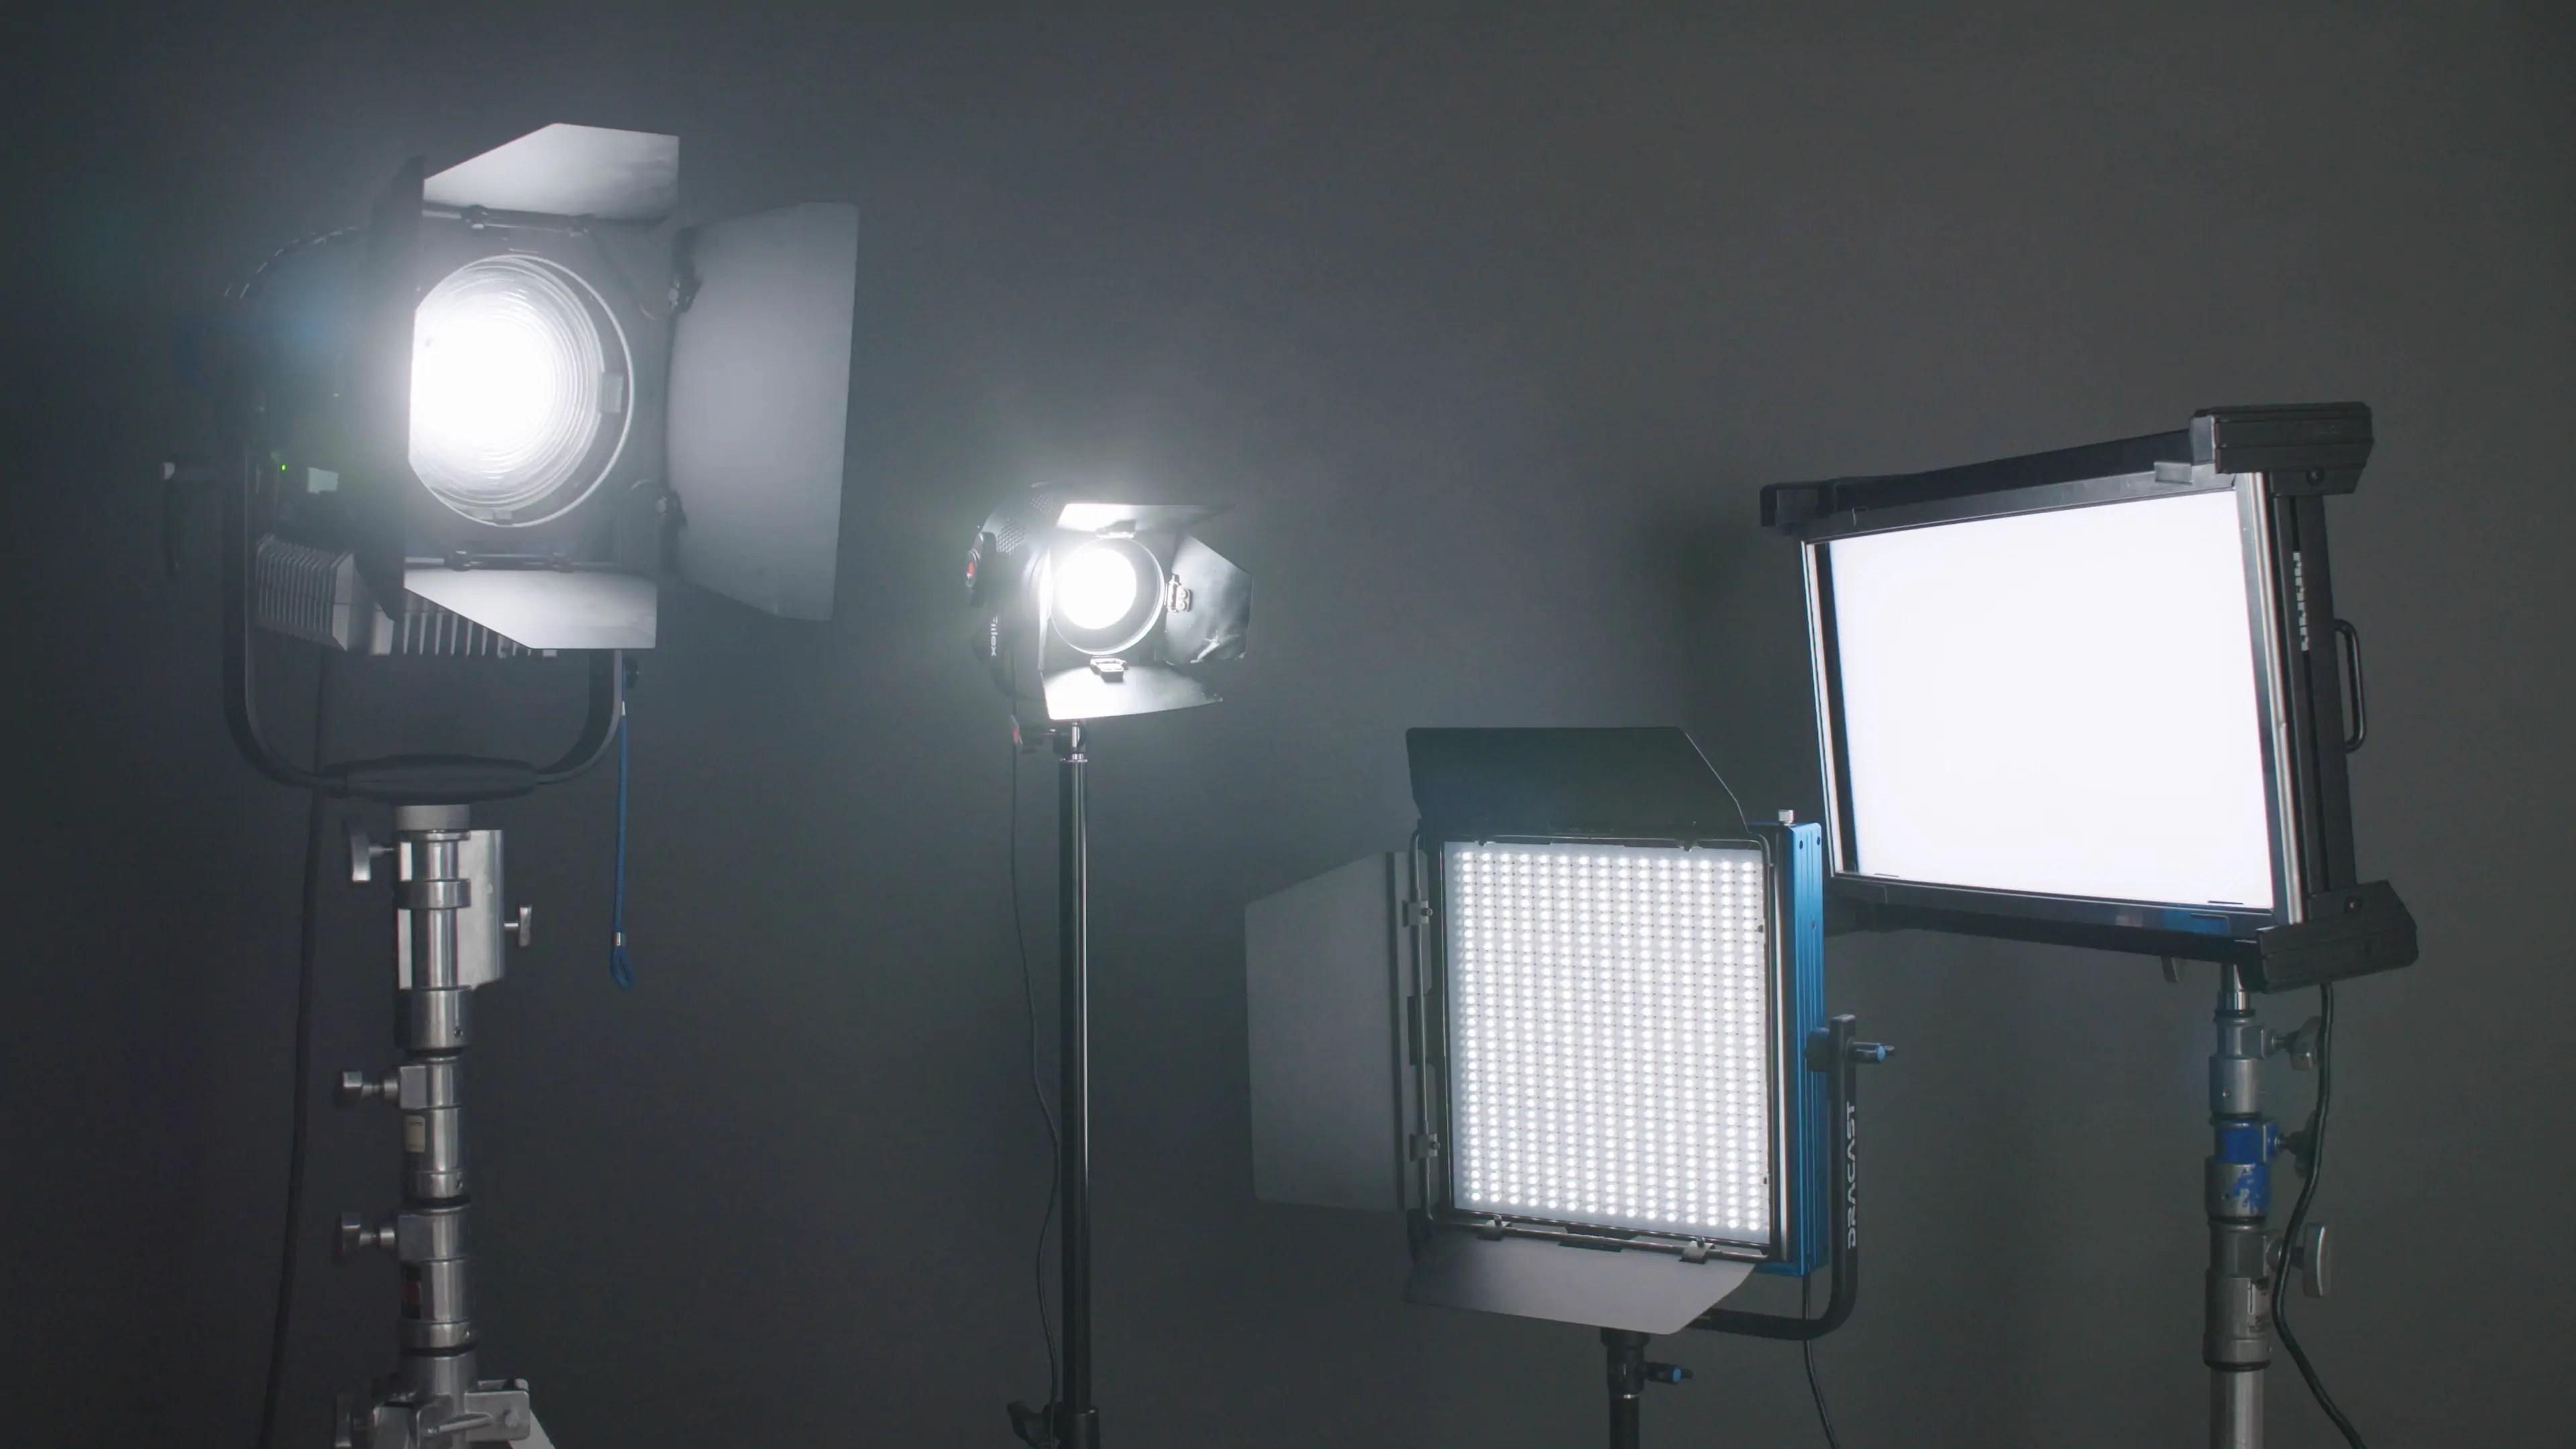 classic interview lighting setup